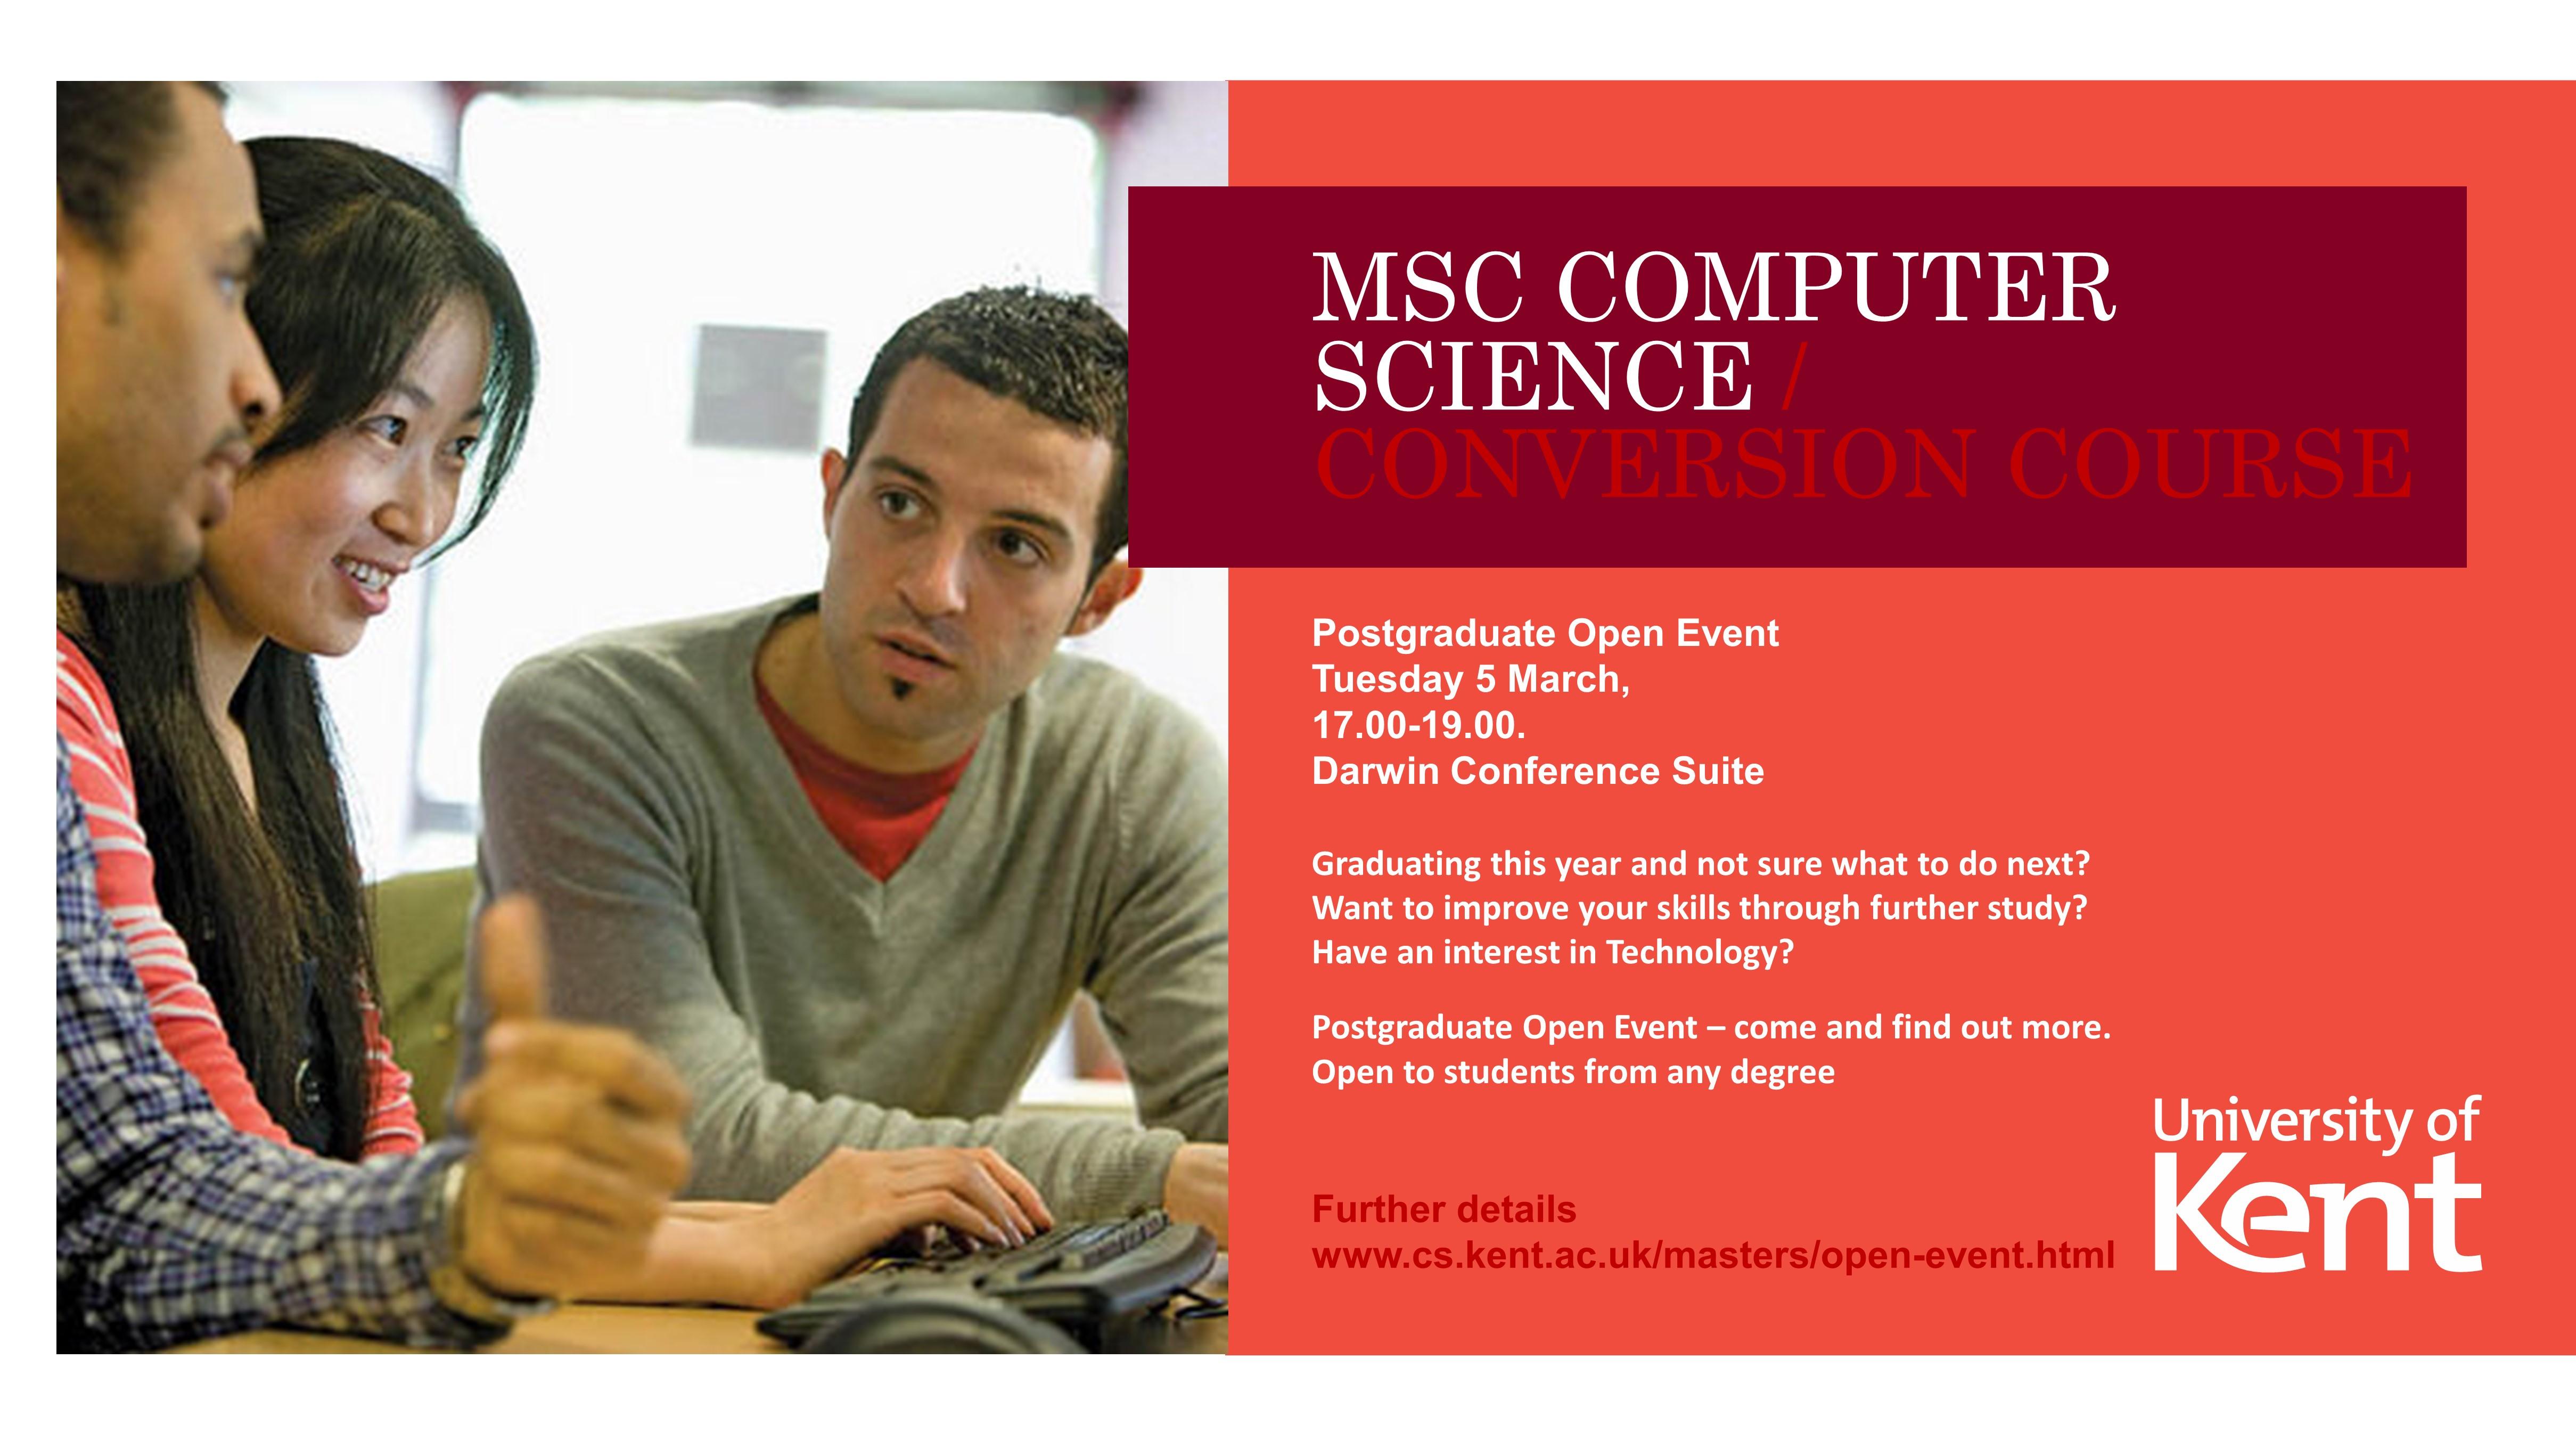 MSc Computer Science conversion course - University of Kent